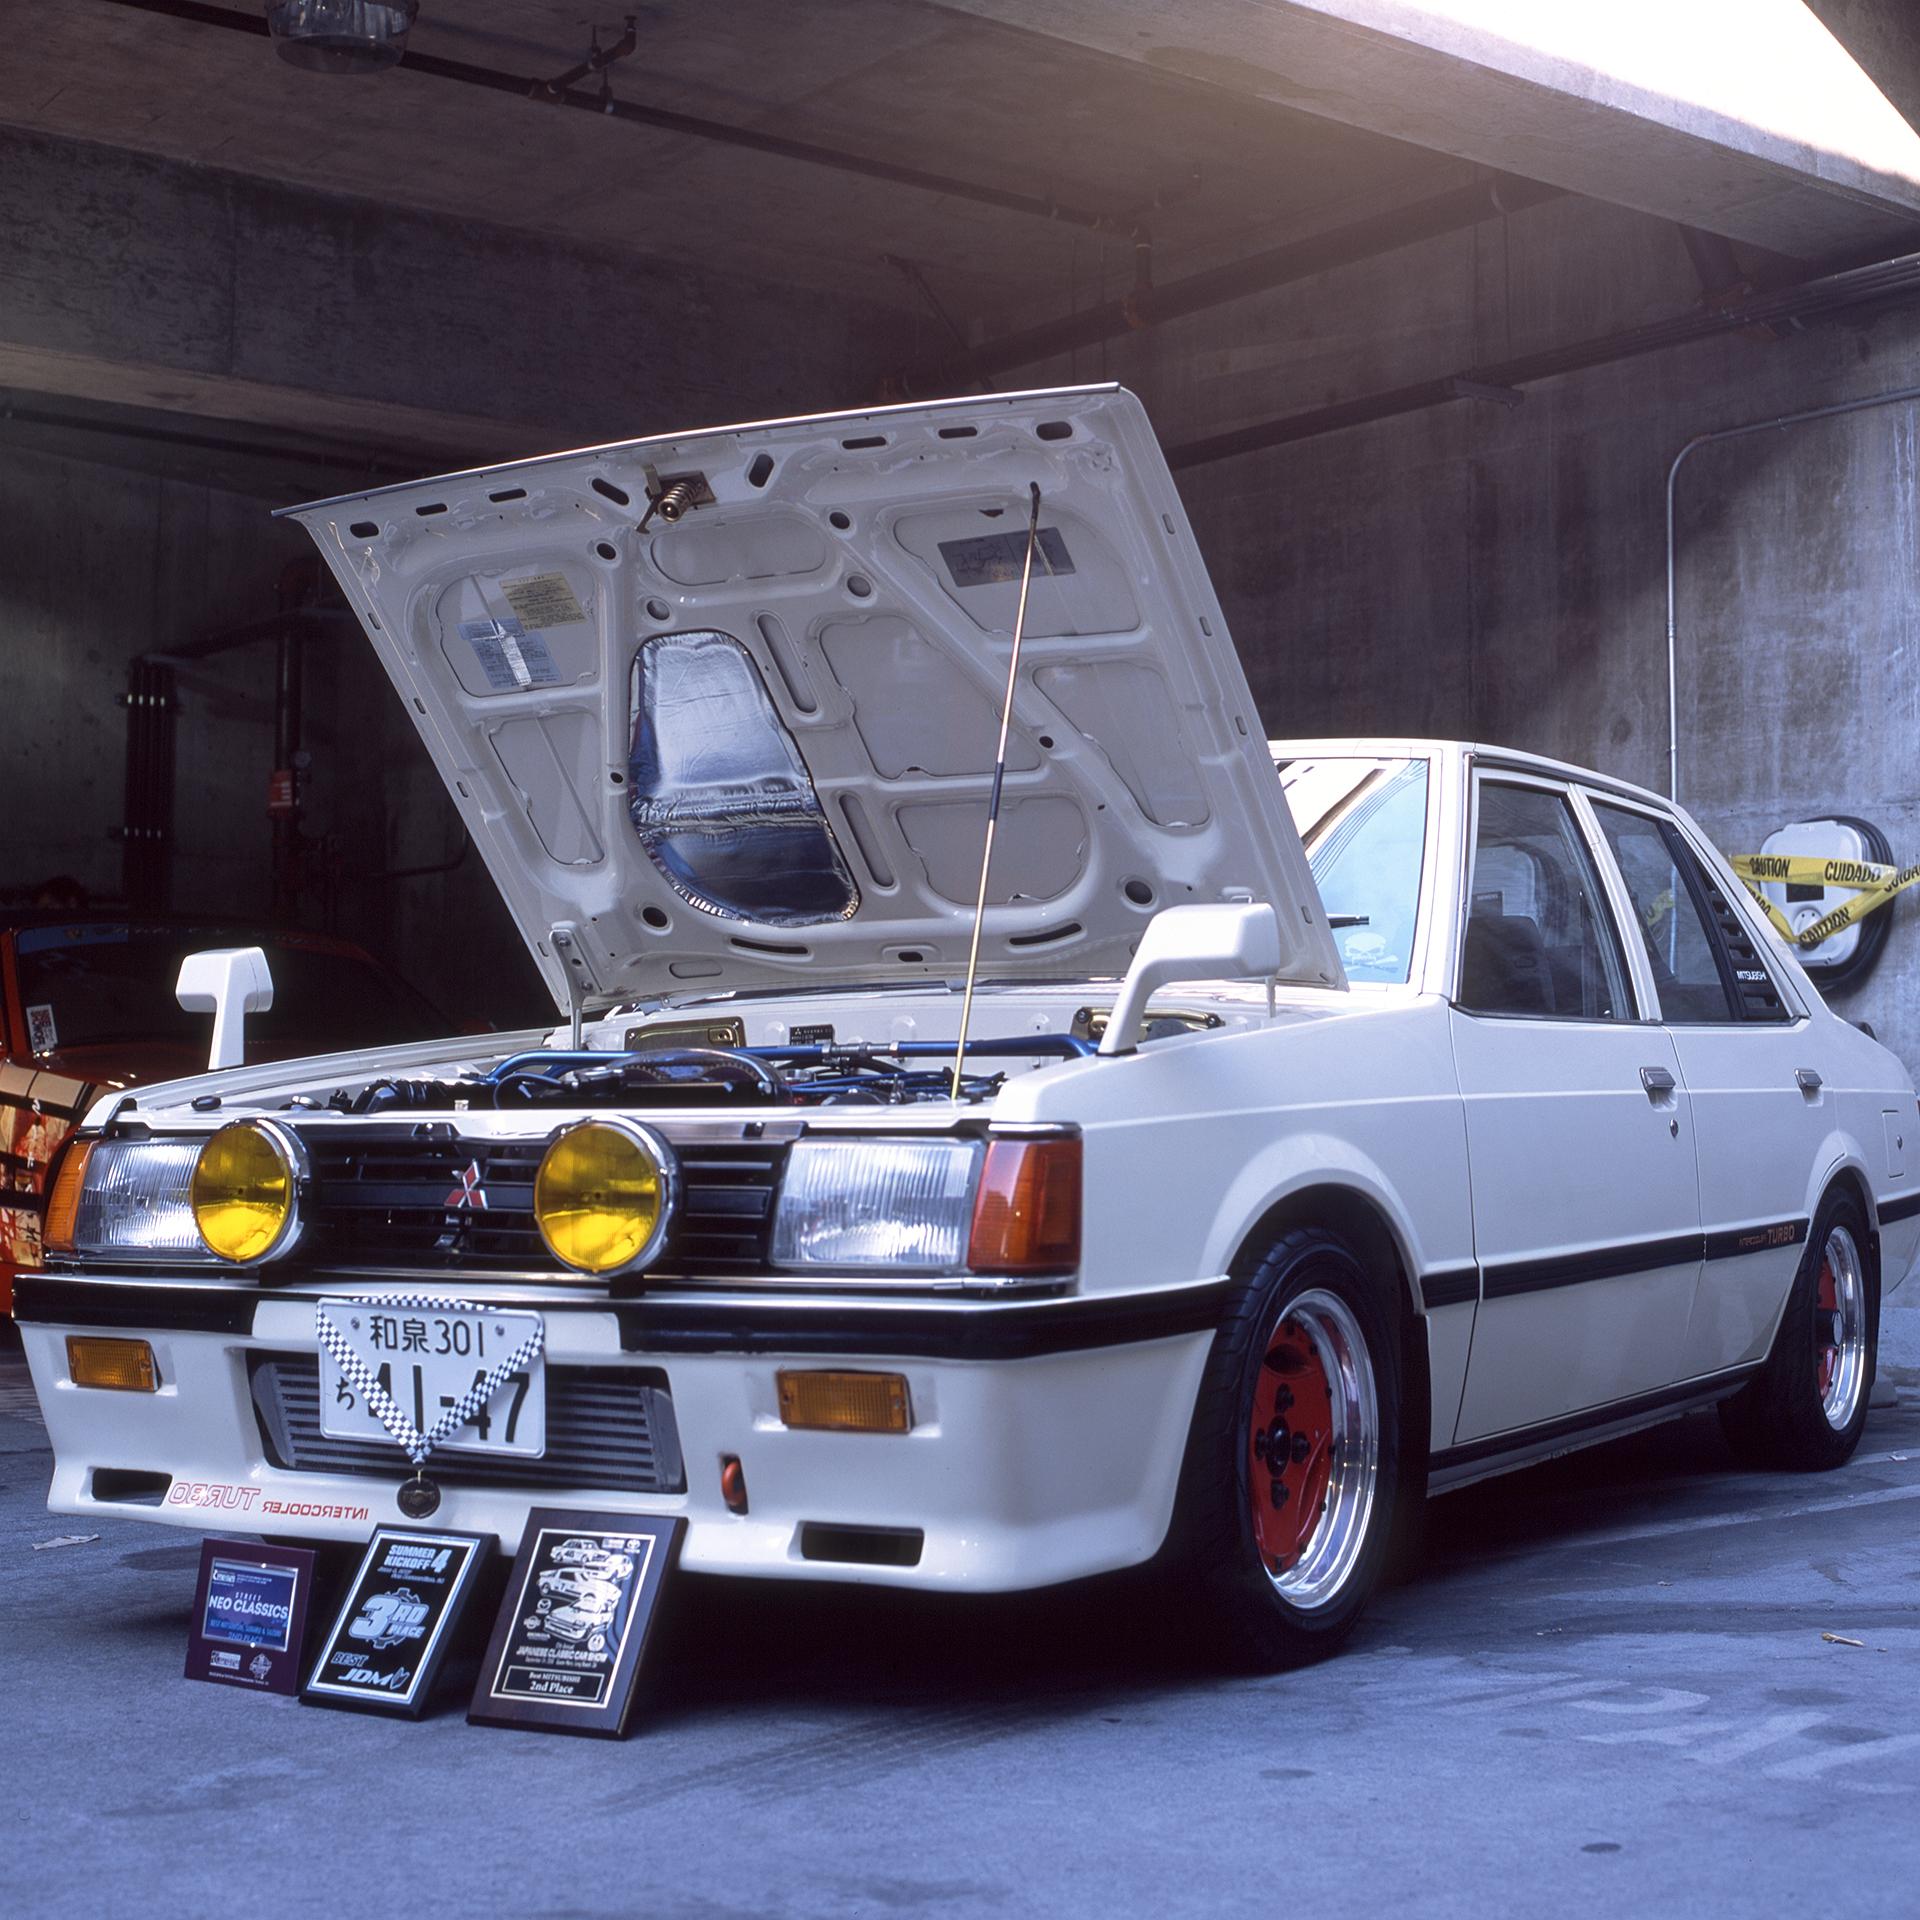 Classic '80's Mitsubishi Lancer Turbo